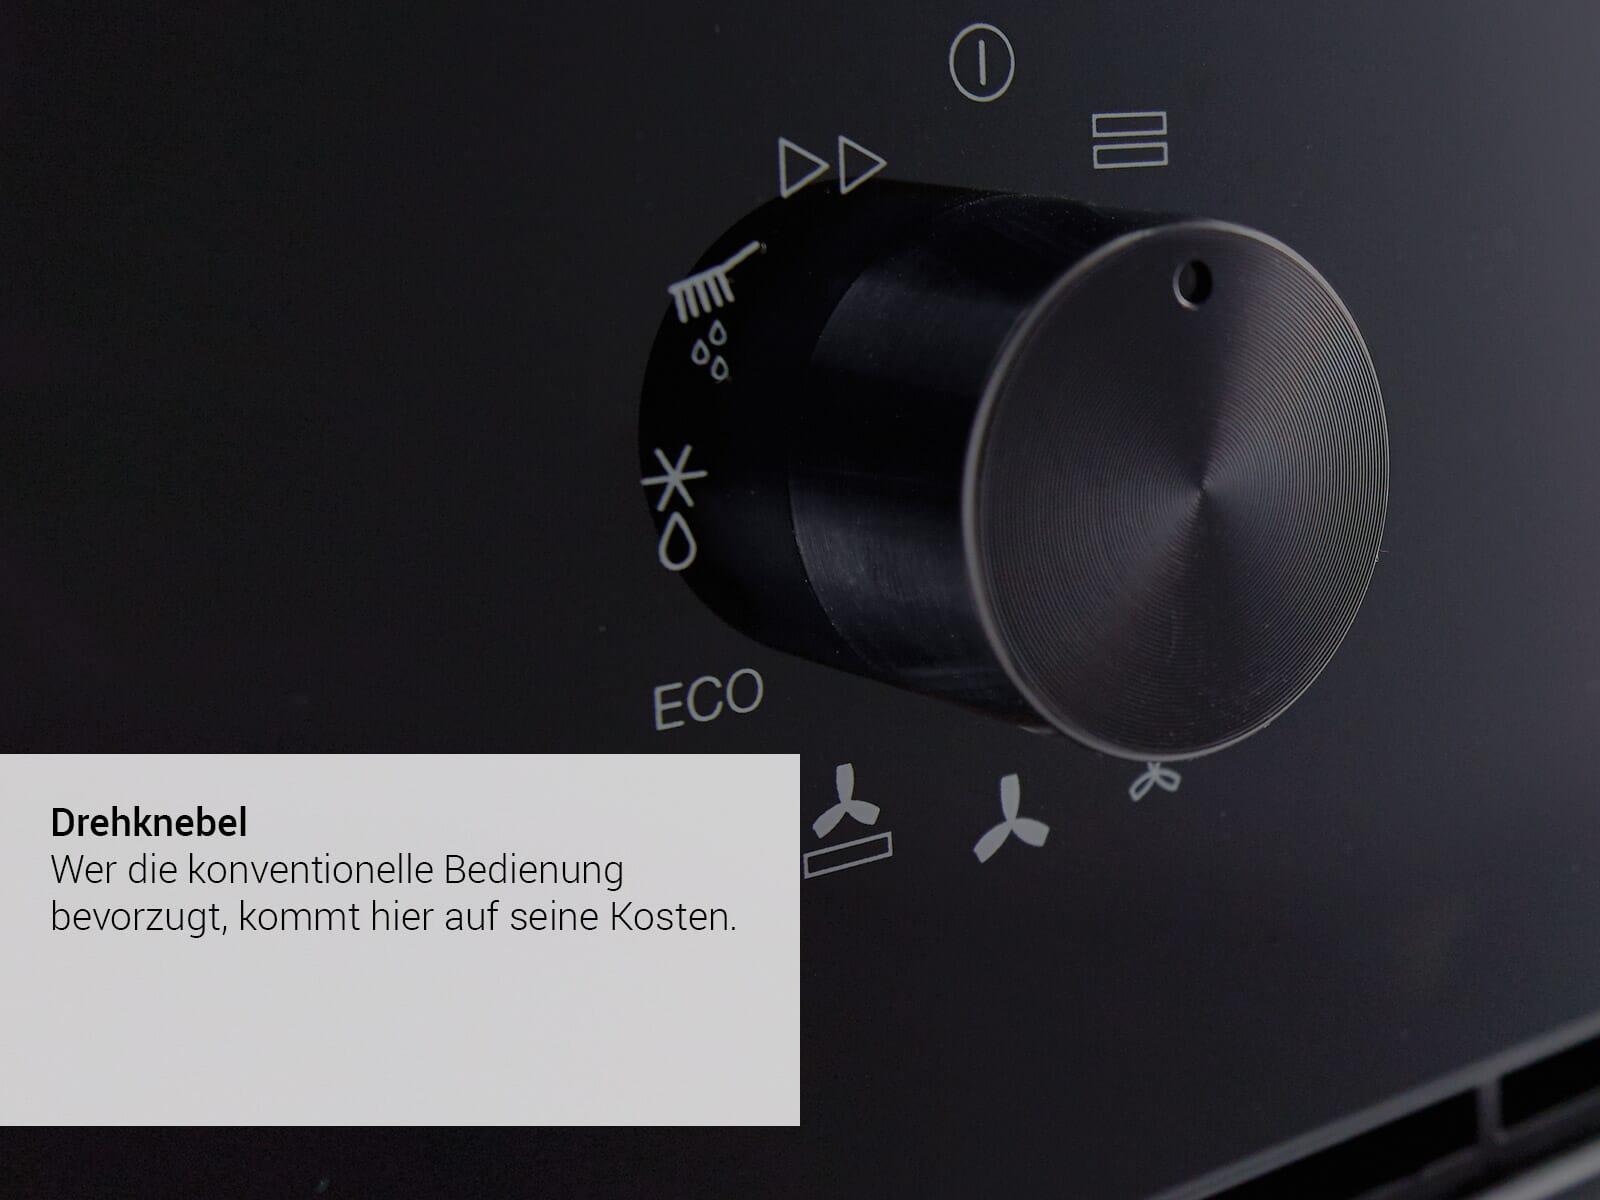 Küppersbusch B 6335.0 S3 Comfort+ Backofen Schwarz/Silver Chrome